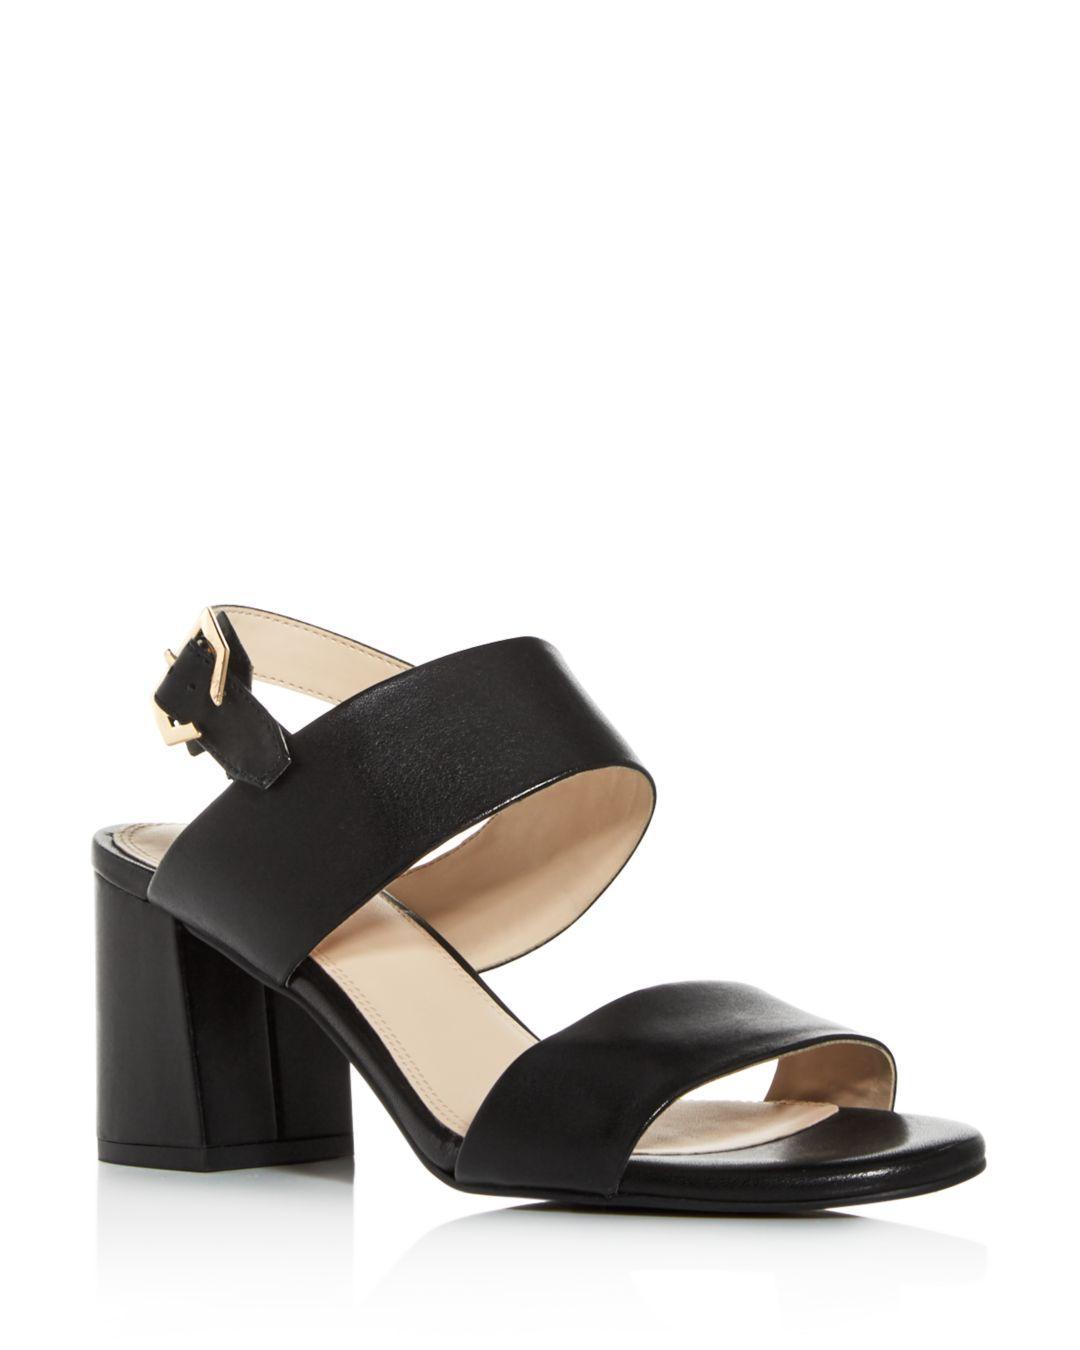 8ae08c0a5d6 Lyst - Cole Haan Women s Avani City Embossed Block-heel Sandals in Black